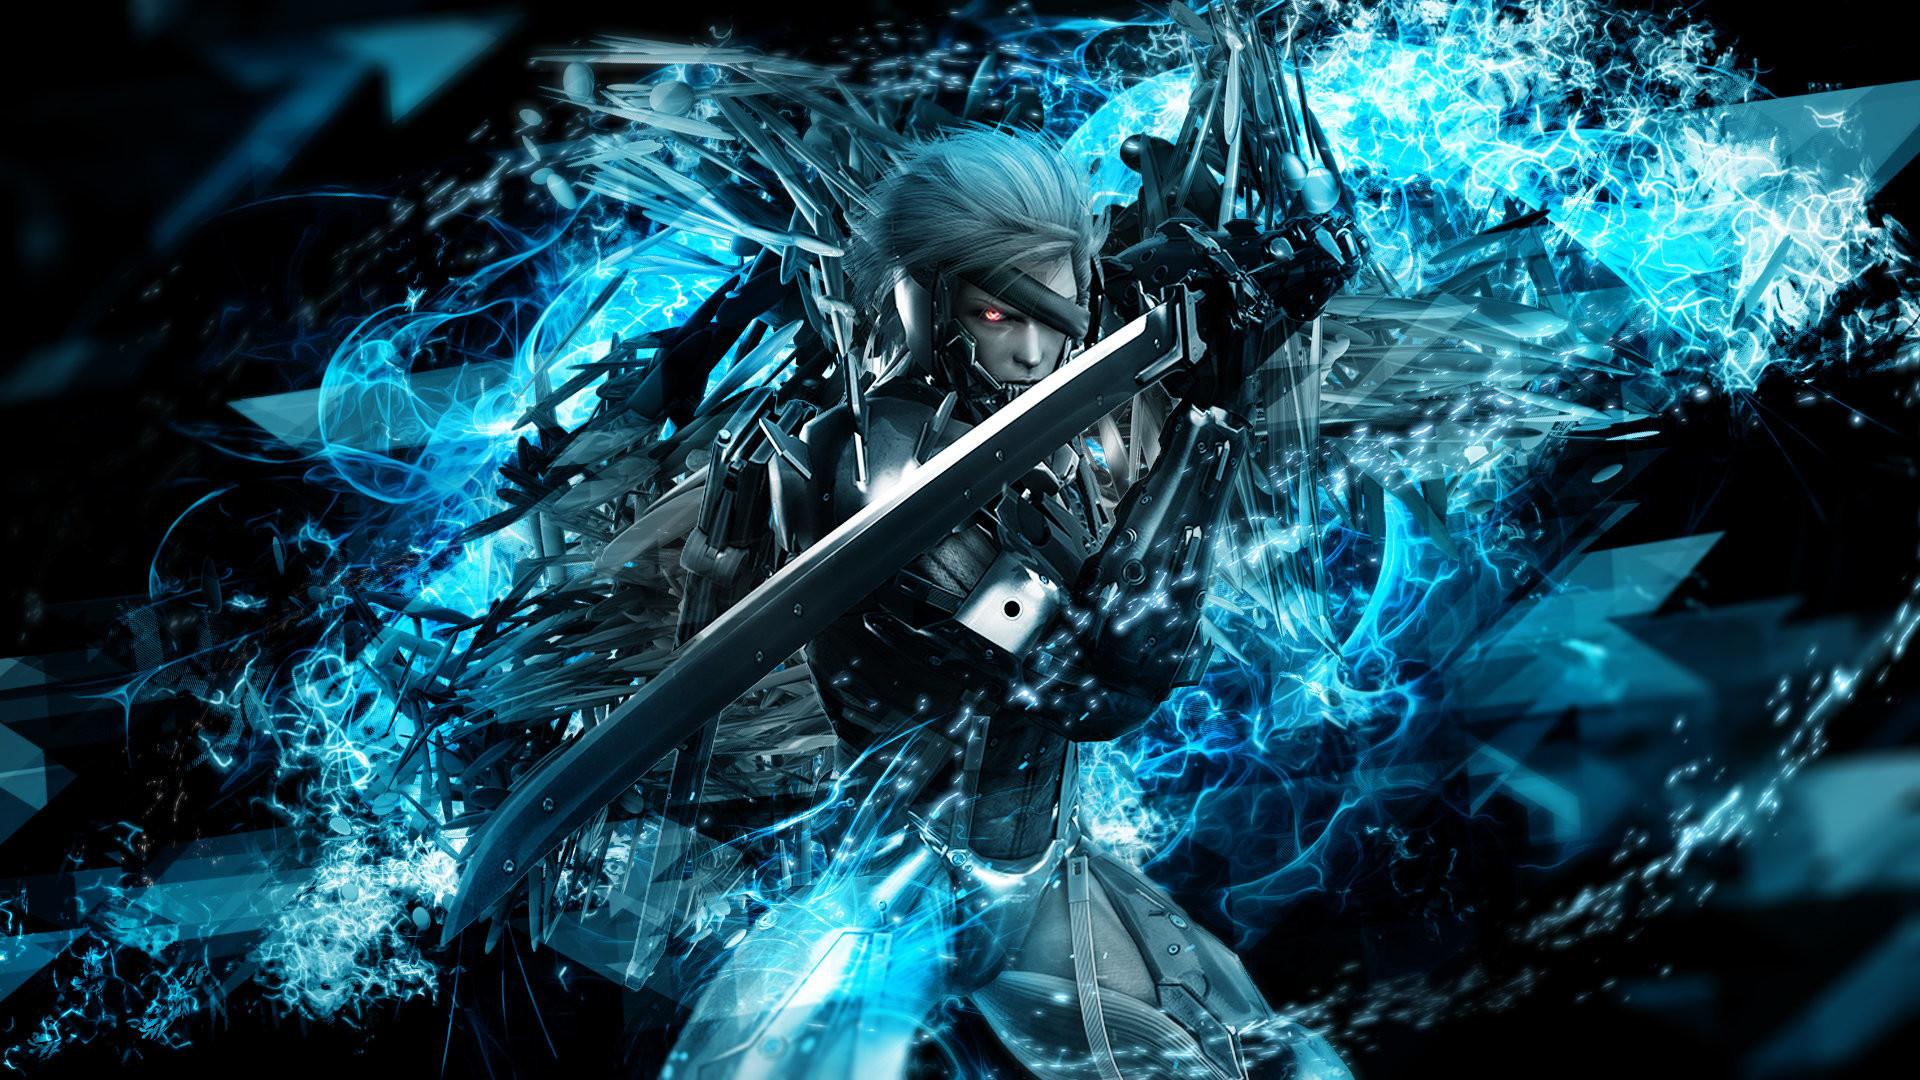 Metal Gear Rising: Revengeance Game 2013 HD Wallpaper Wallpaper